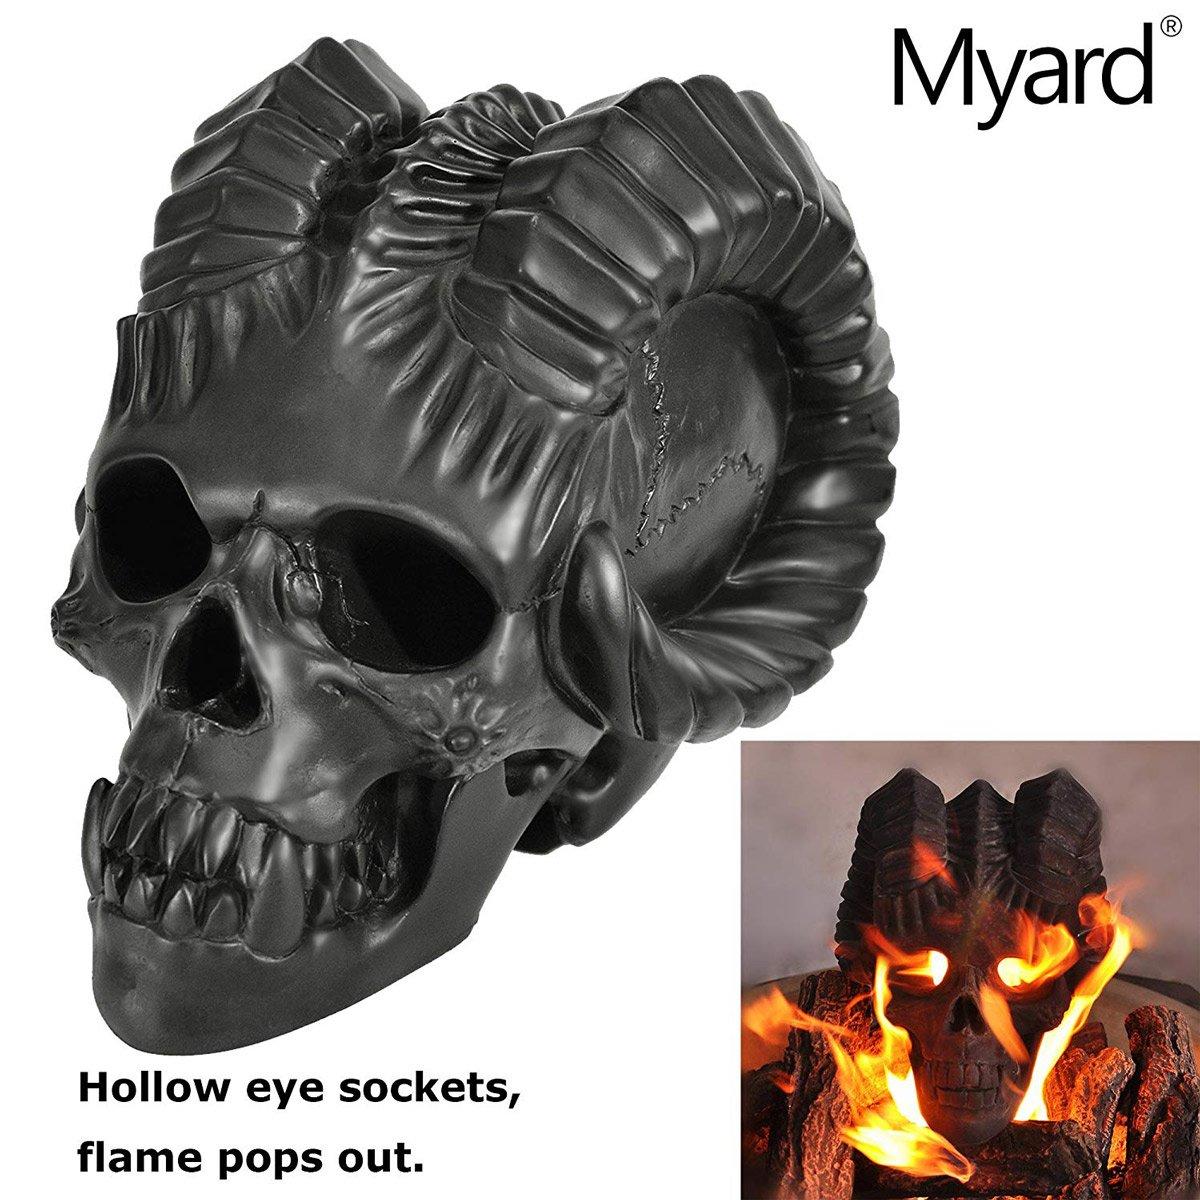 fire pit demon skull the green head